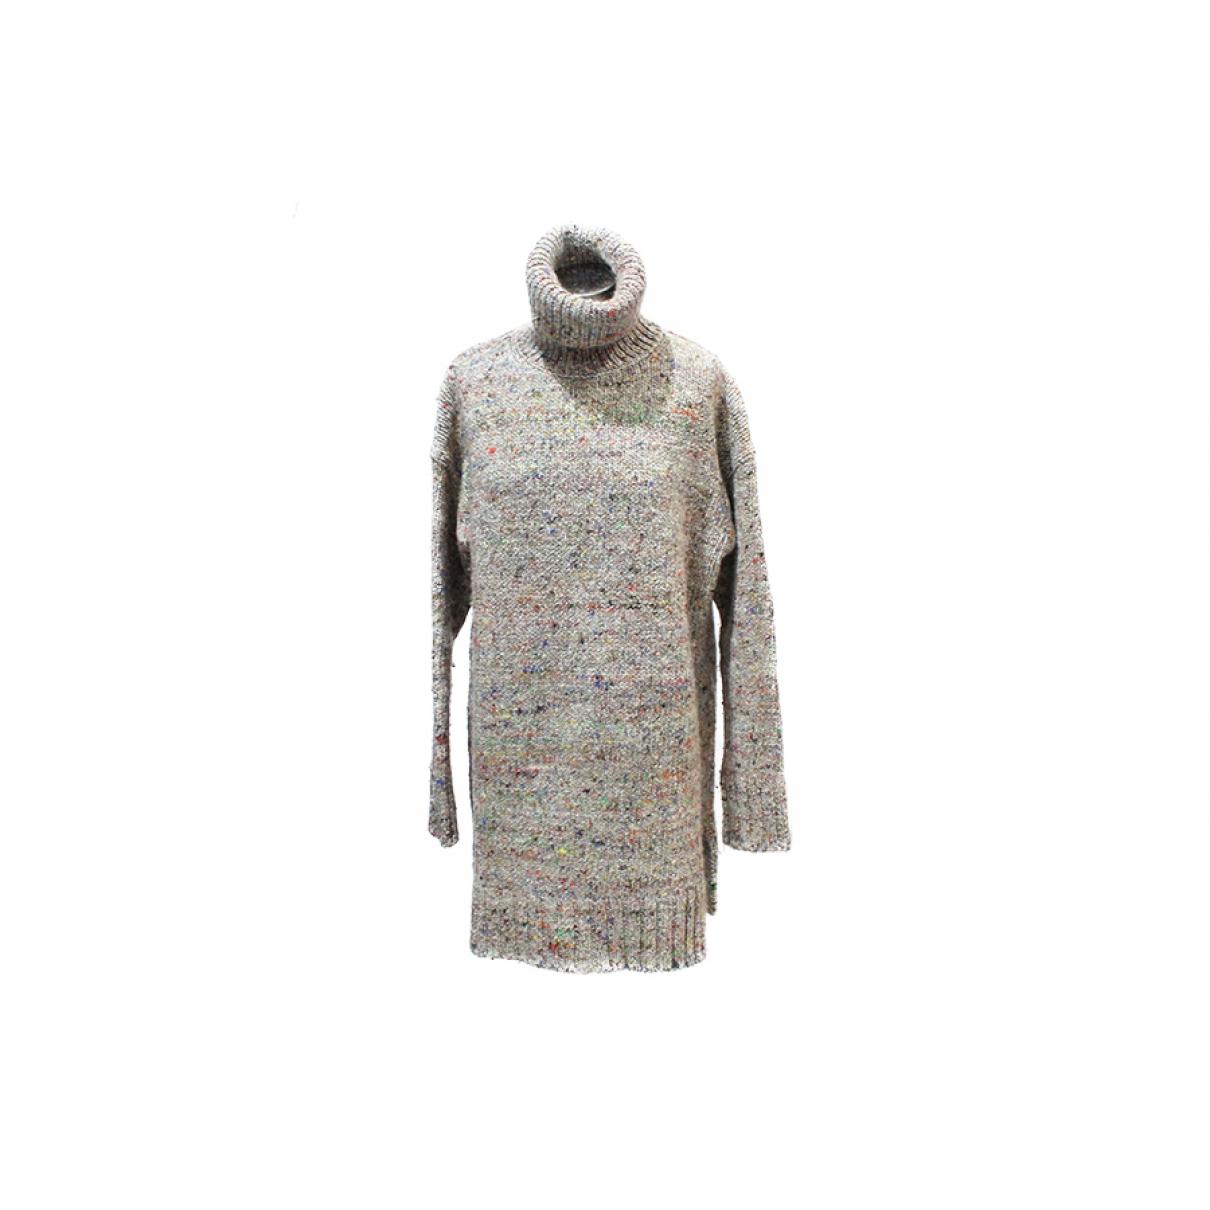 Celine \N Pullover in  Beige Wolle